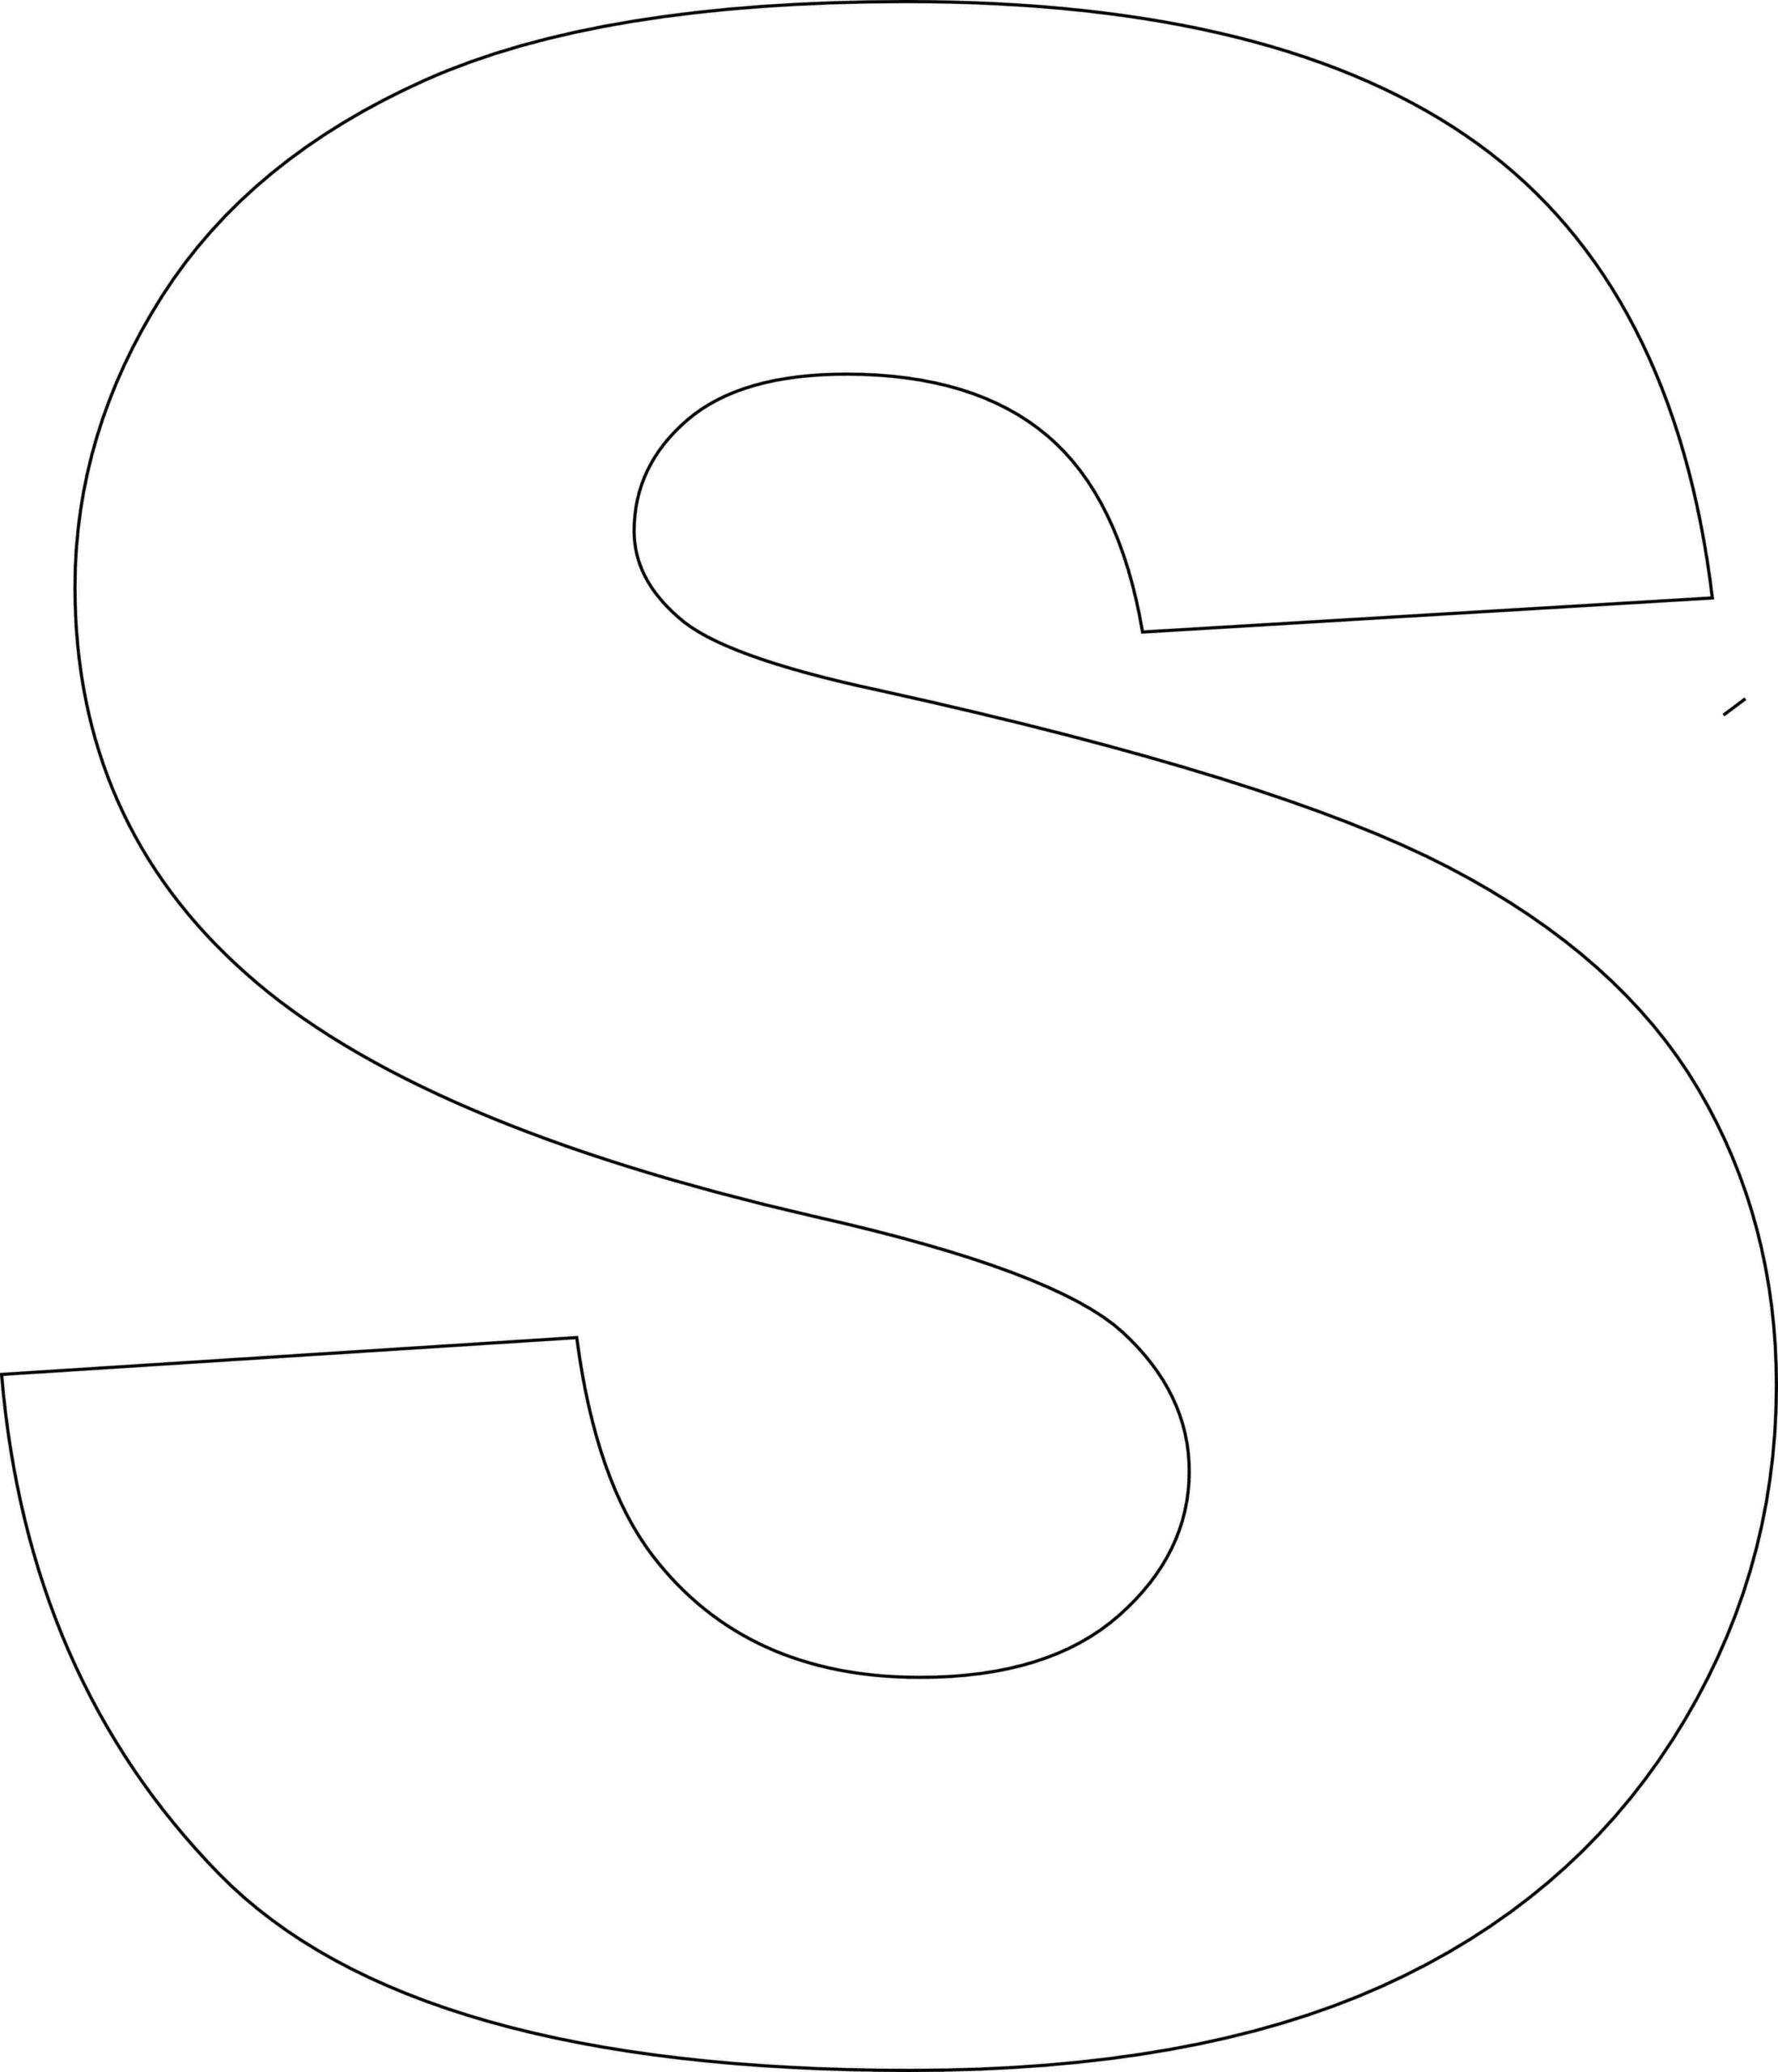 Worksheet ~ Alphabet Letterss For Free Sparklebox Theme To pertaining to Letter L Worksheets Sparklebox